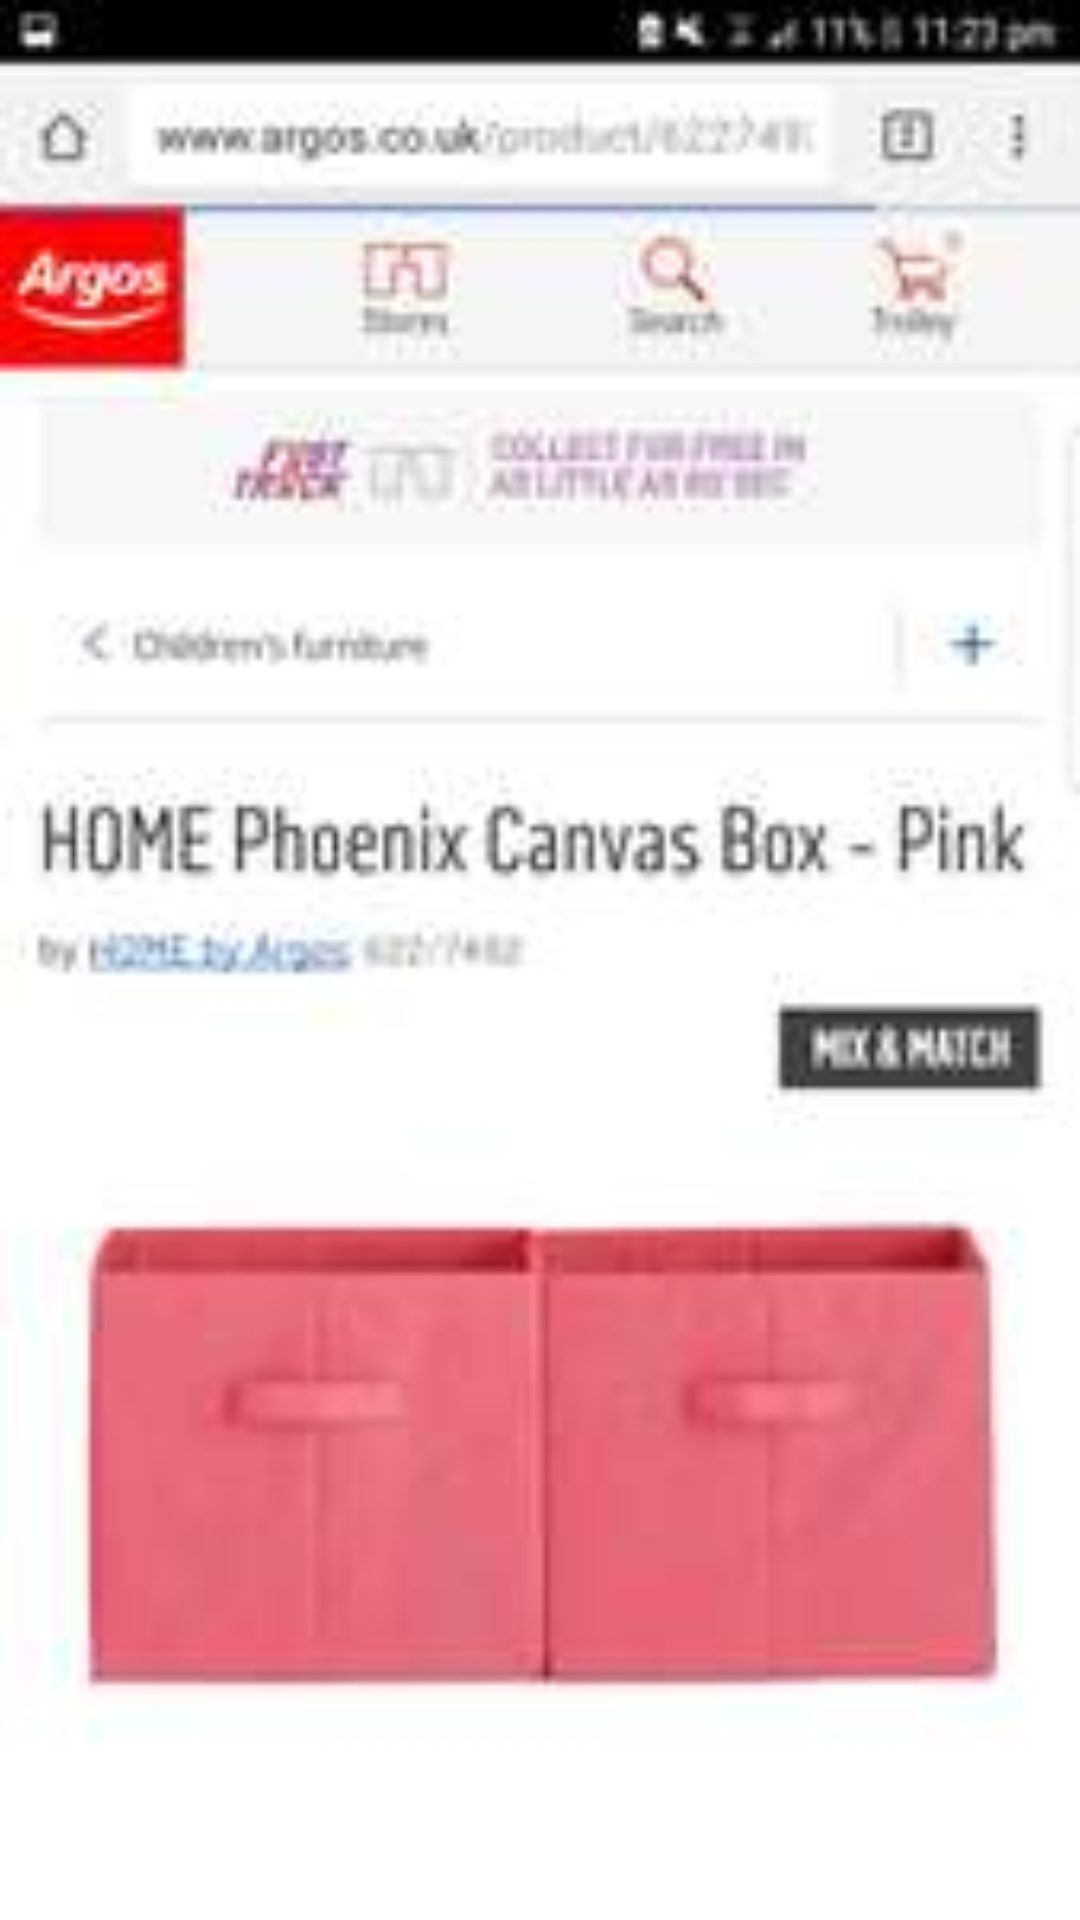 HOME Phoenix Canvas Box 2 set for £5.98 @ Argos